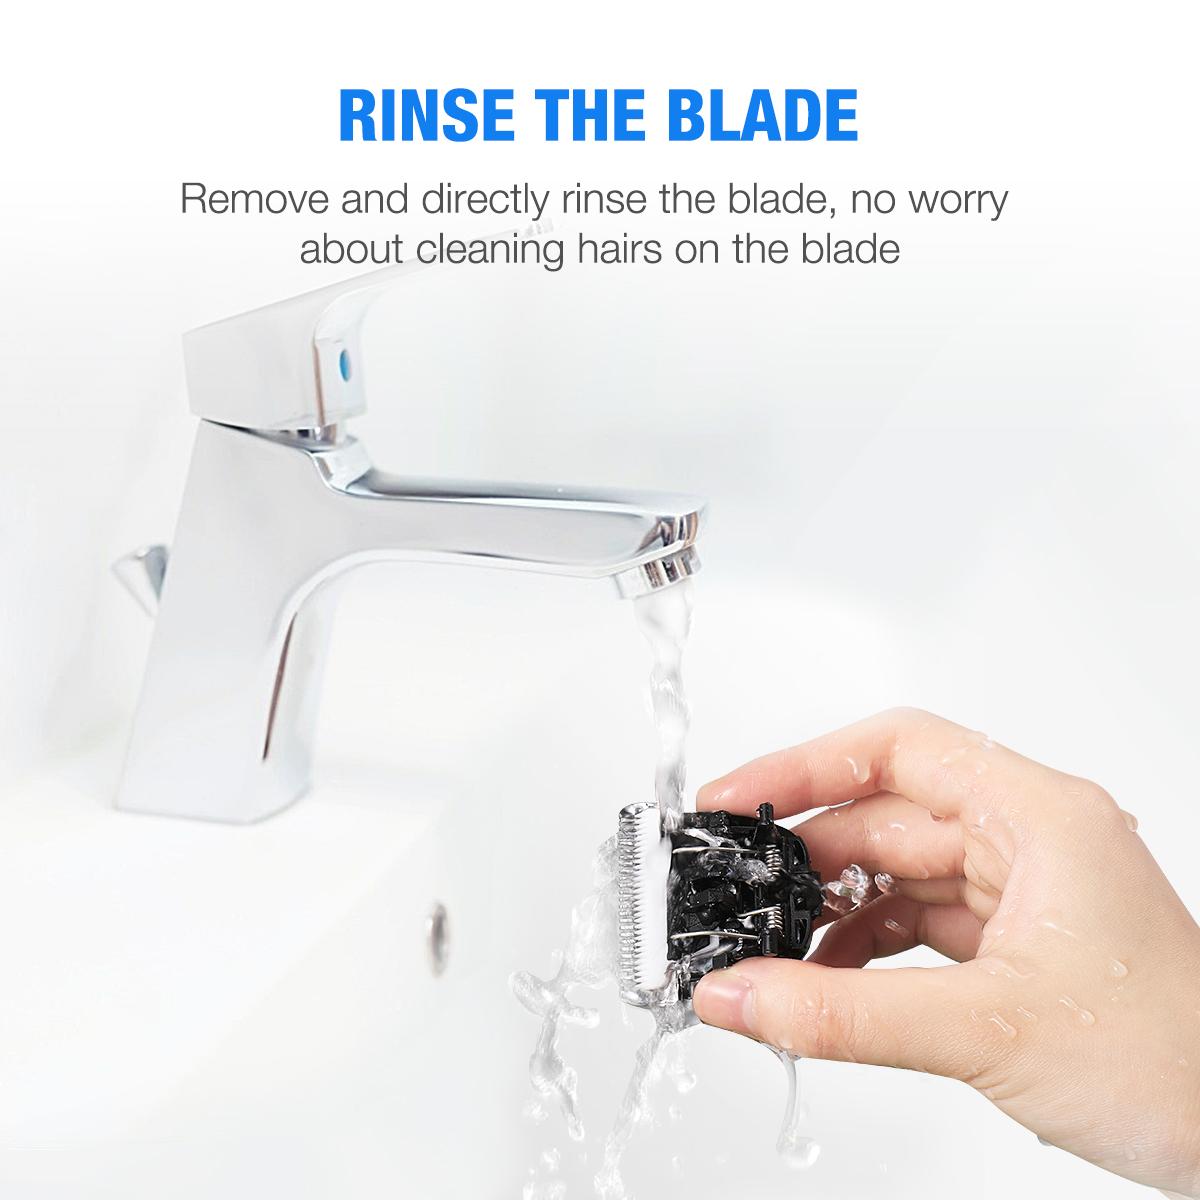 Professional Hair Clipper & Beard Trimmer, Cordless Waterproof Hair Cutting Kit - Black